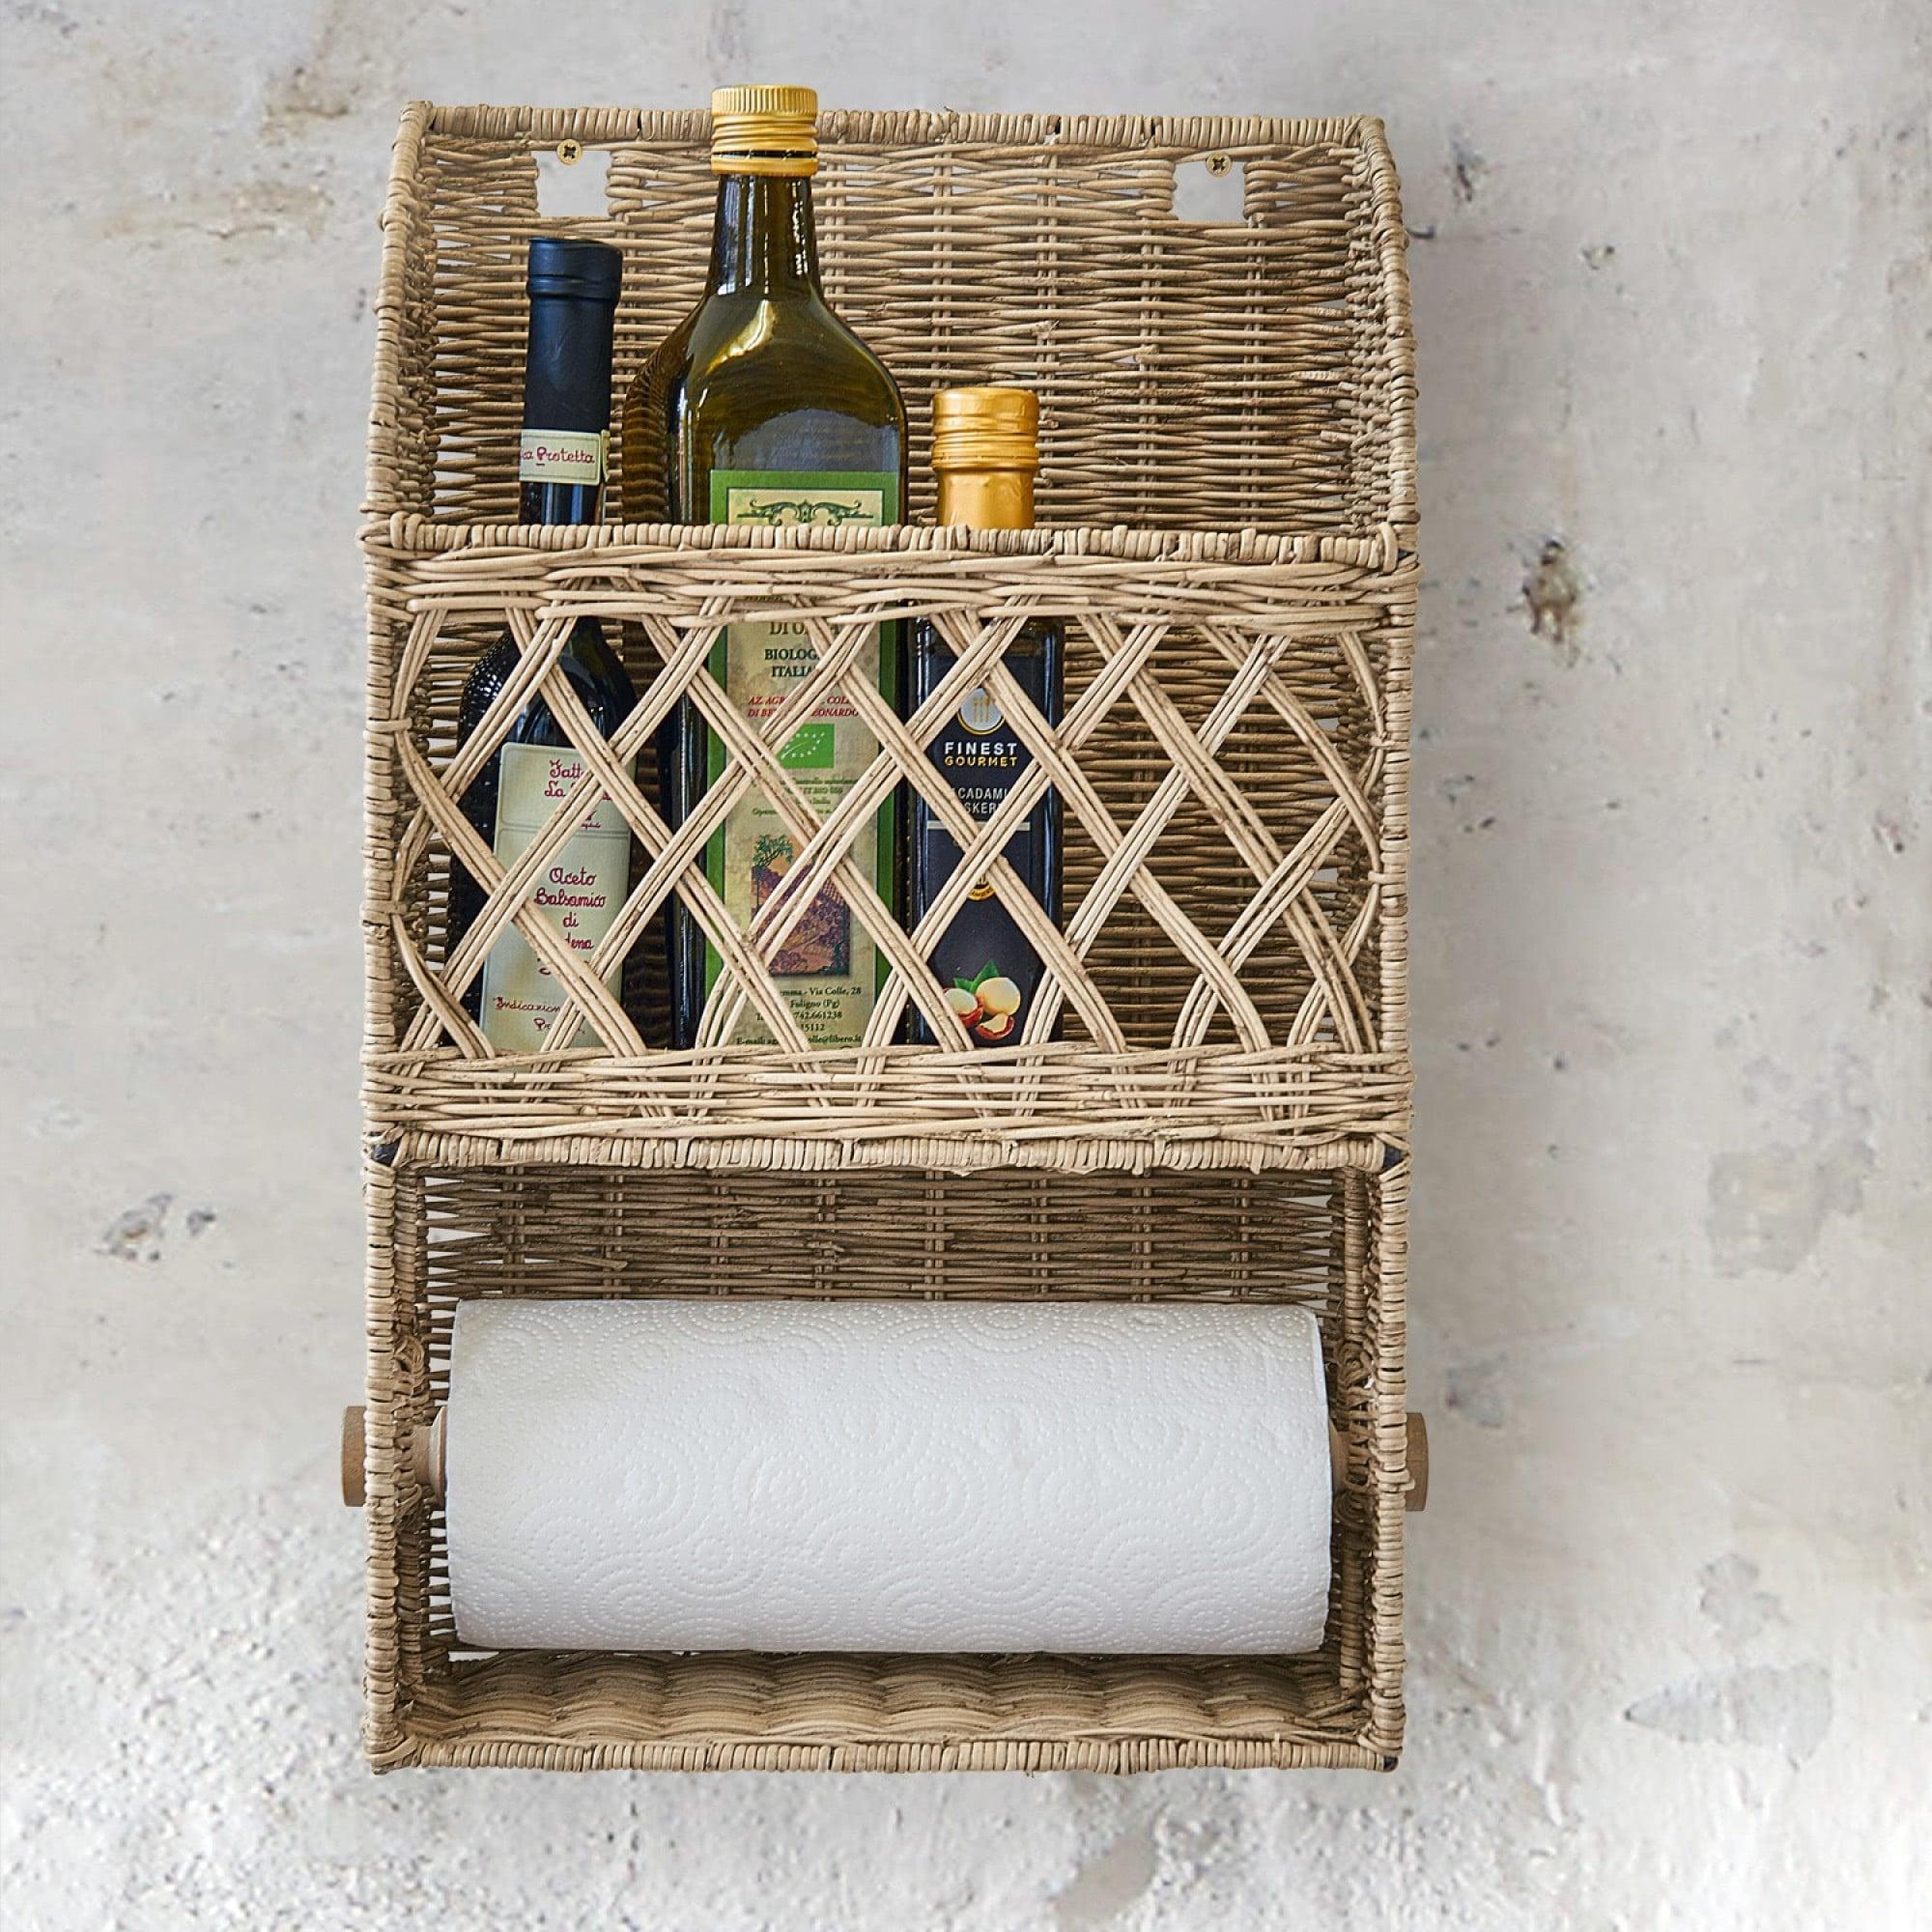 k chen organizer connaire loberon coming home. Black Bedroom Furniture Sets. Home Design Ideas